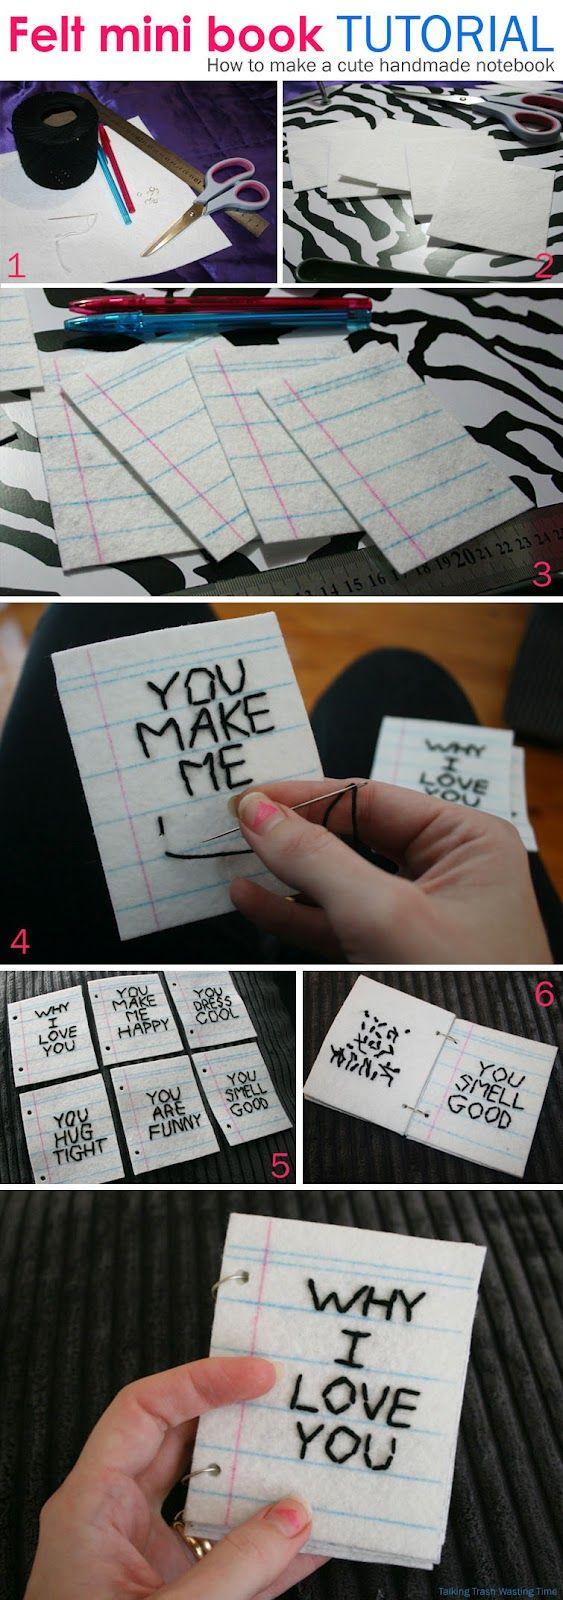 Talking Trash & Wasting Time: DIY Mini felt notebook